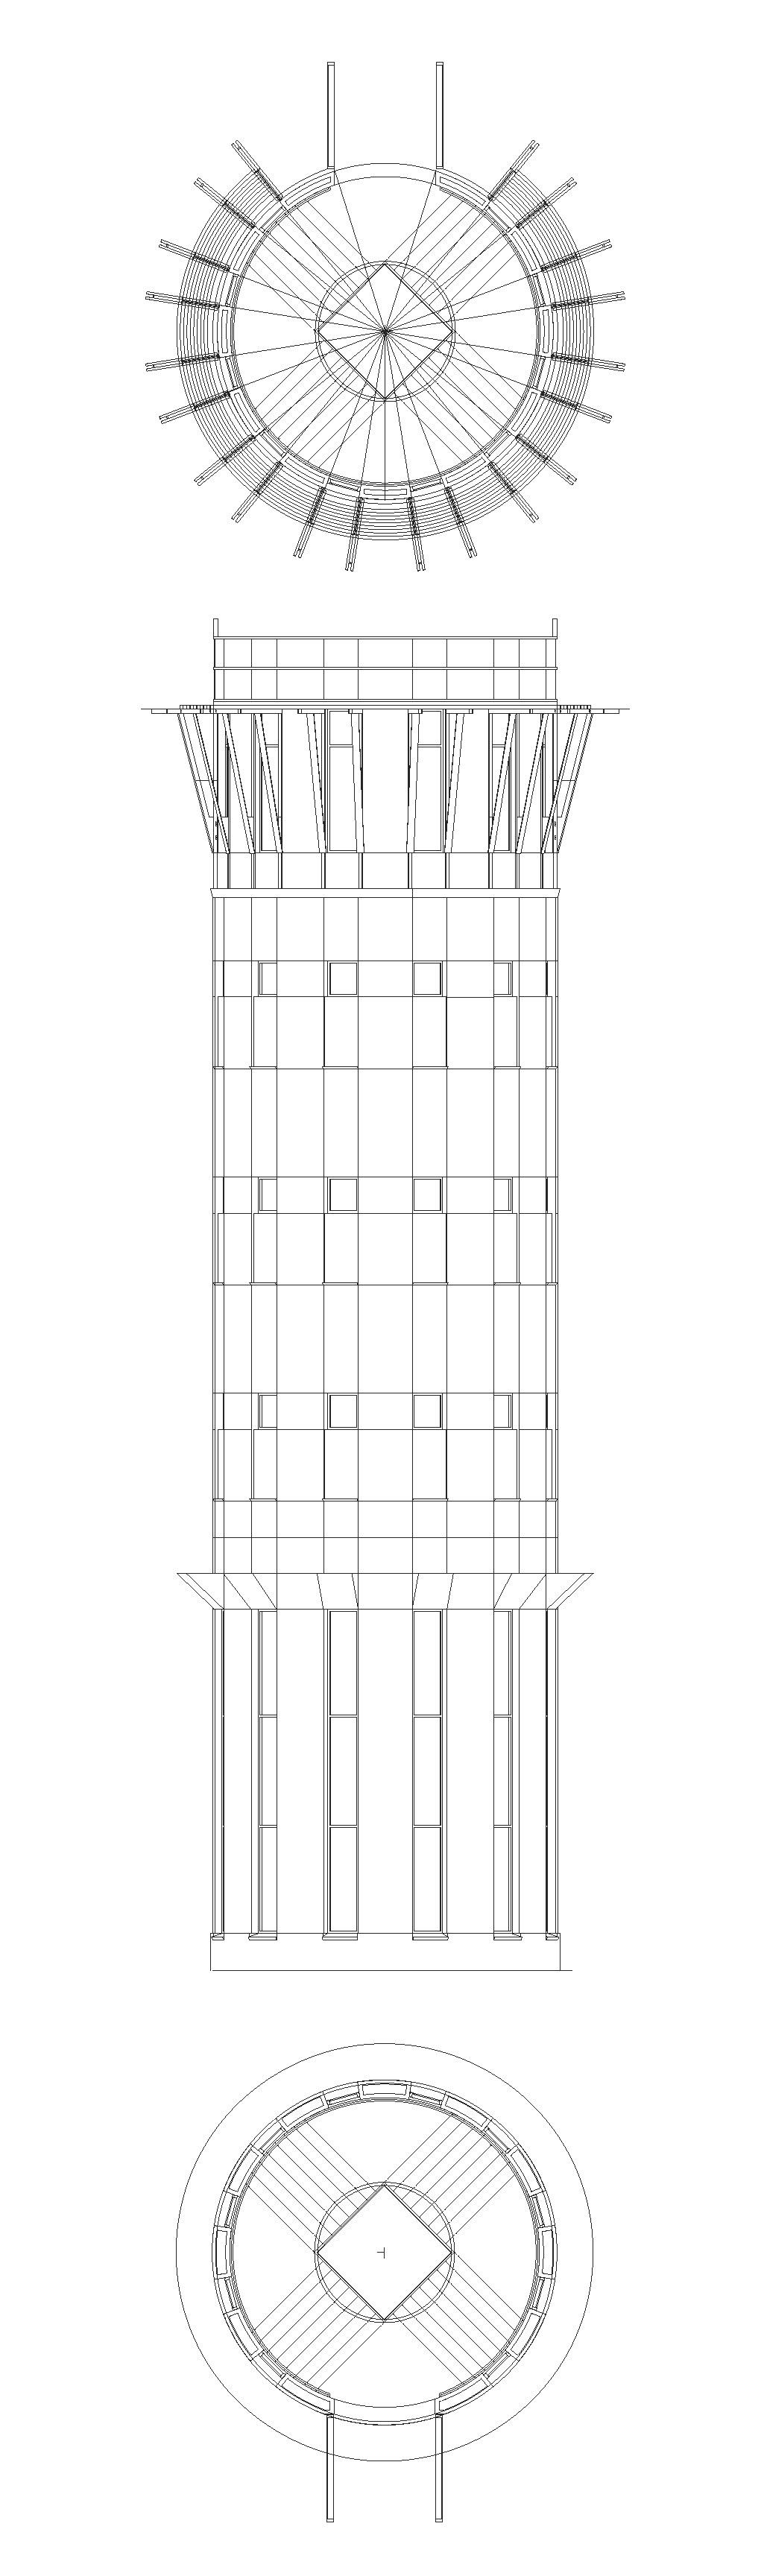 Texas stair tower.jpg